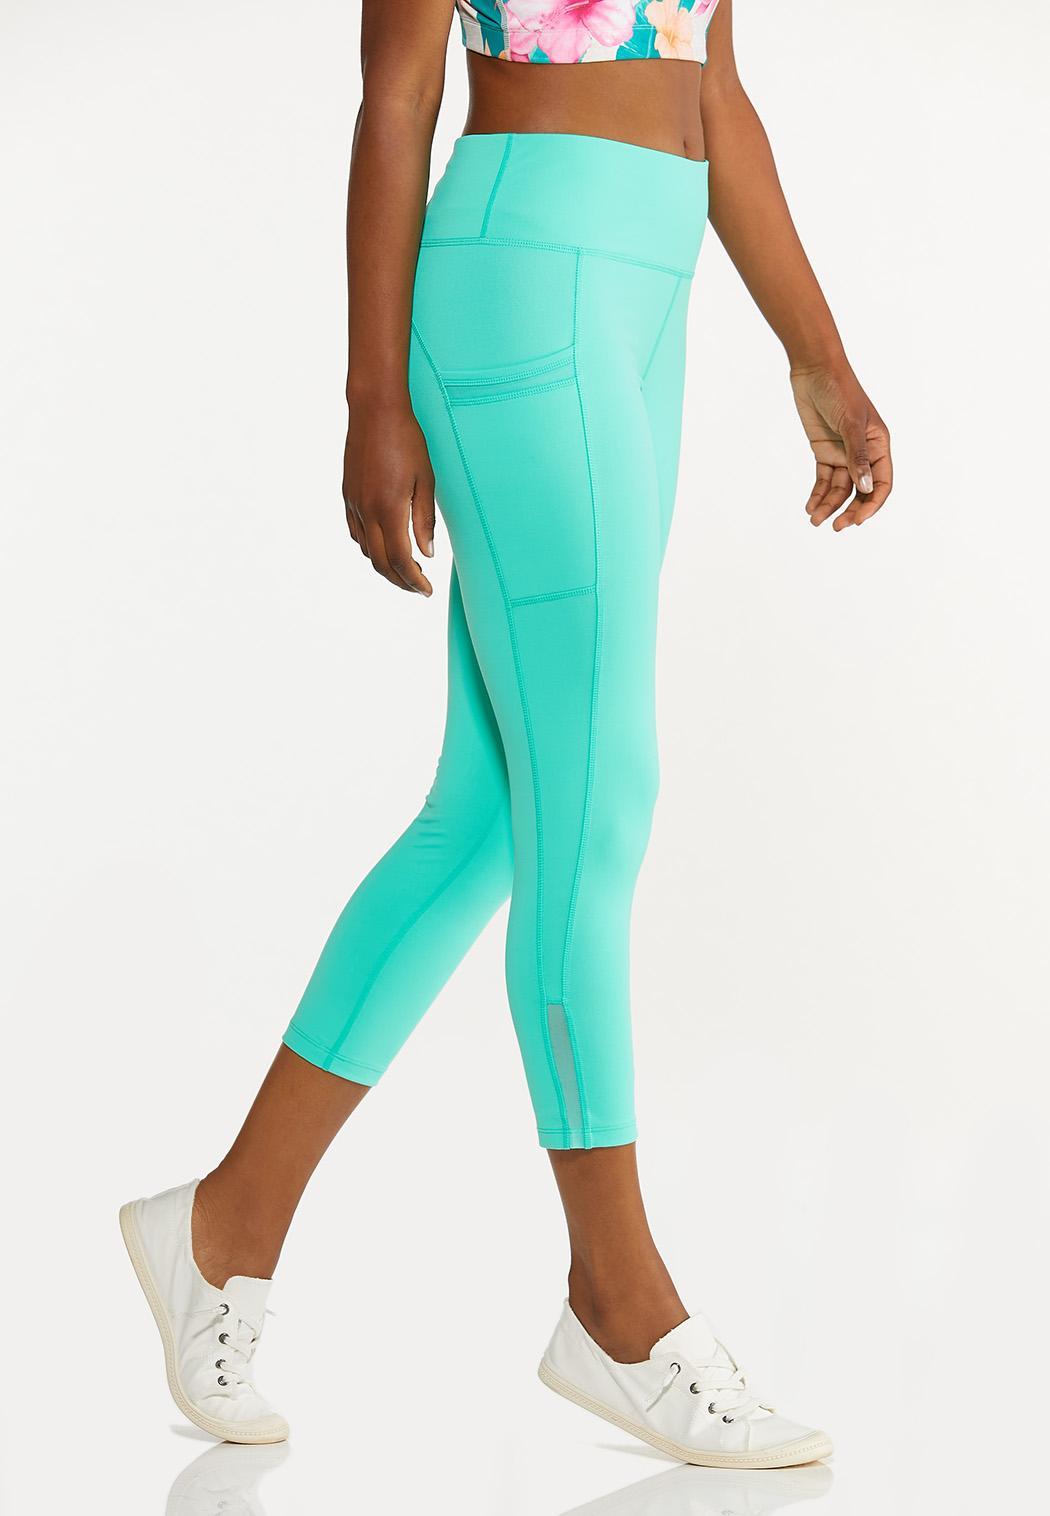 Cropped Turquoise Leggings (Item #44548260)